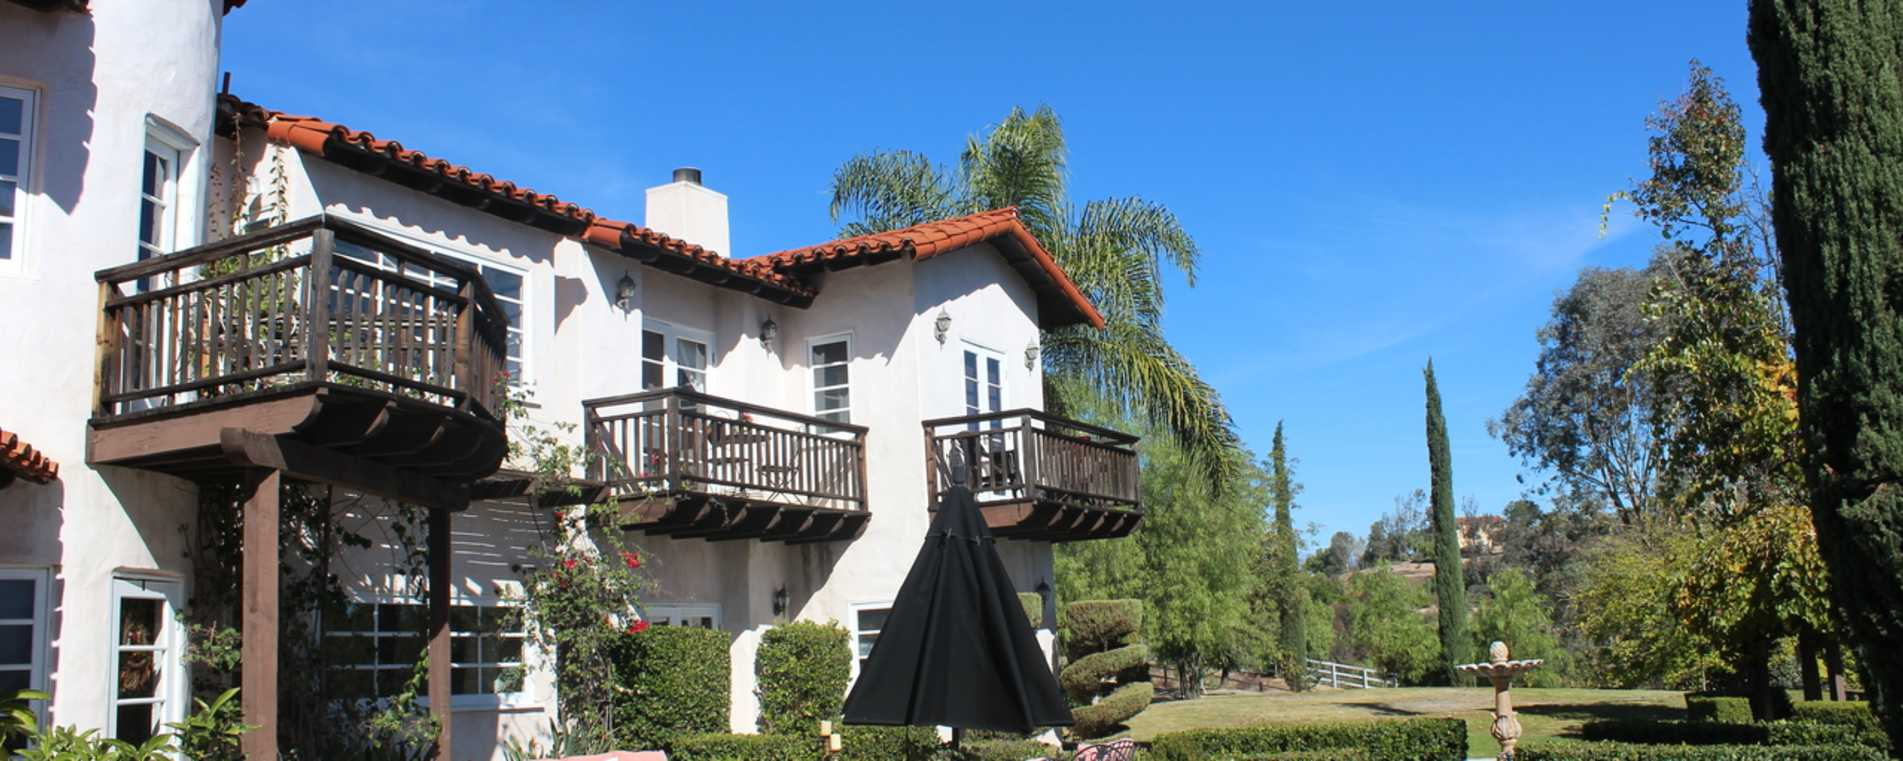 Spanish Colonial - Perfect Getaways Inc.